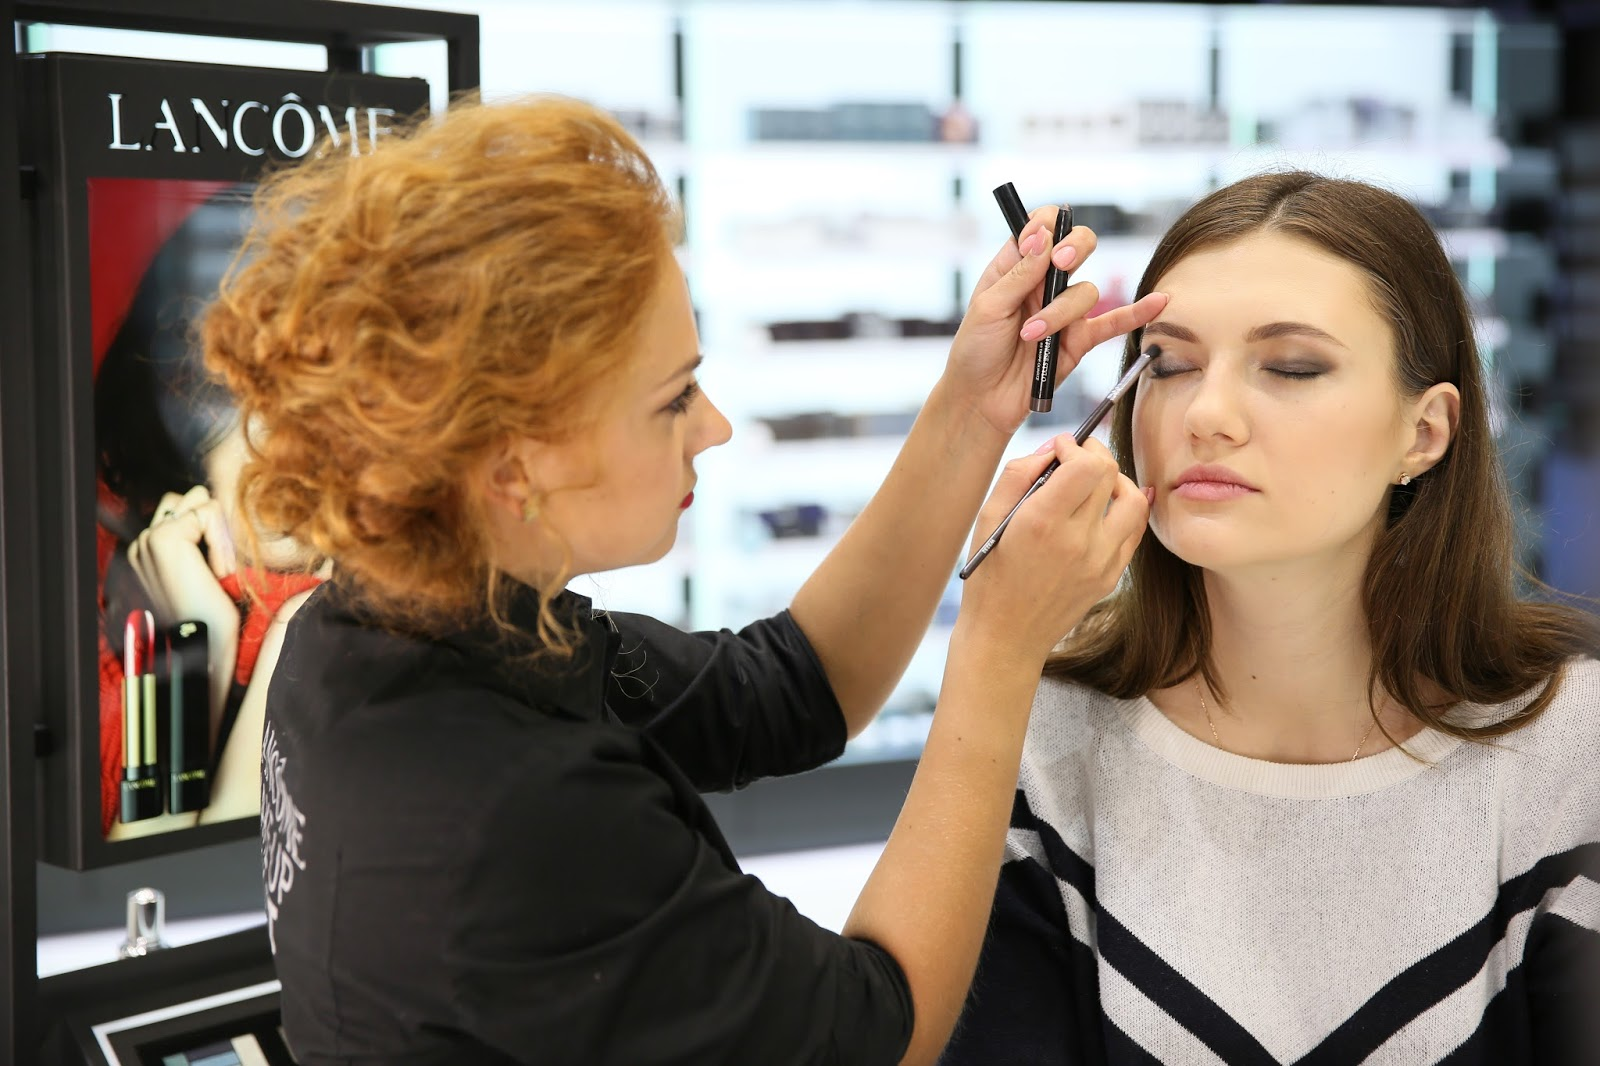 Brocard трц Украина, My Lancome Day, макияжный корнер Lancome, визажист Анастасия Мехеда